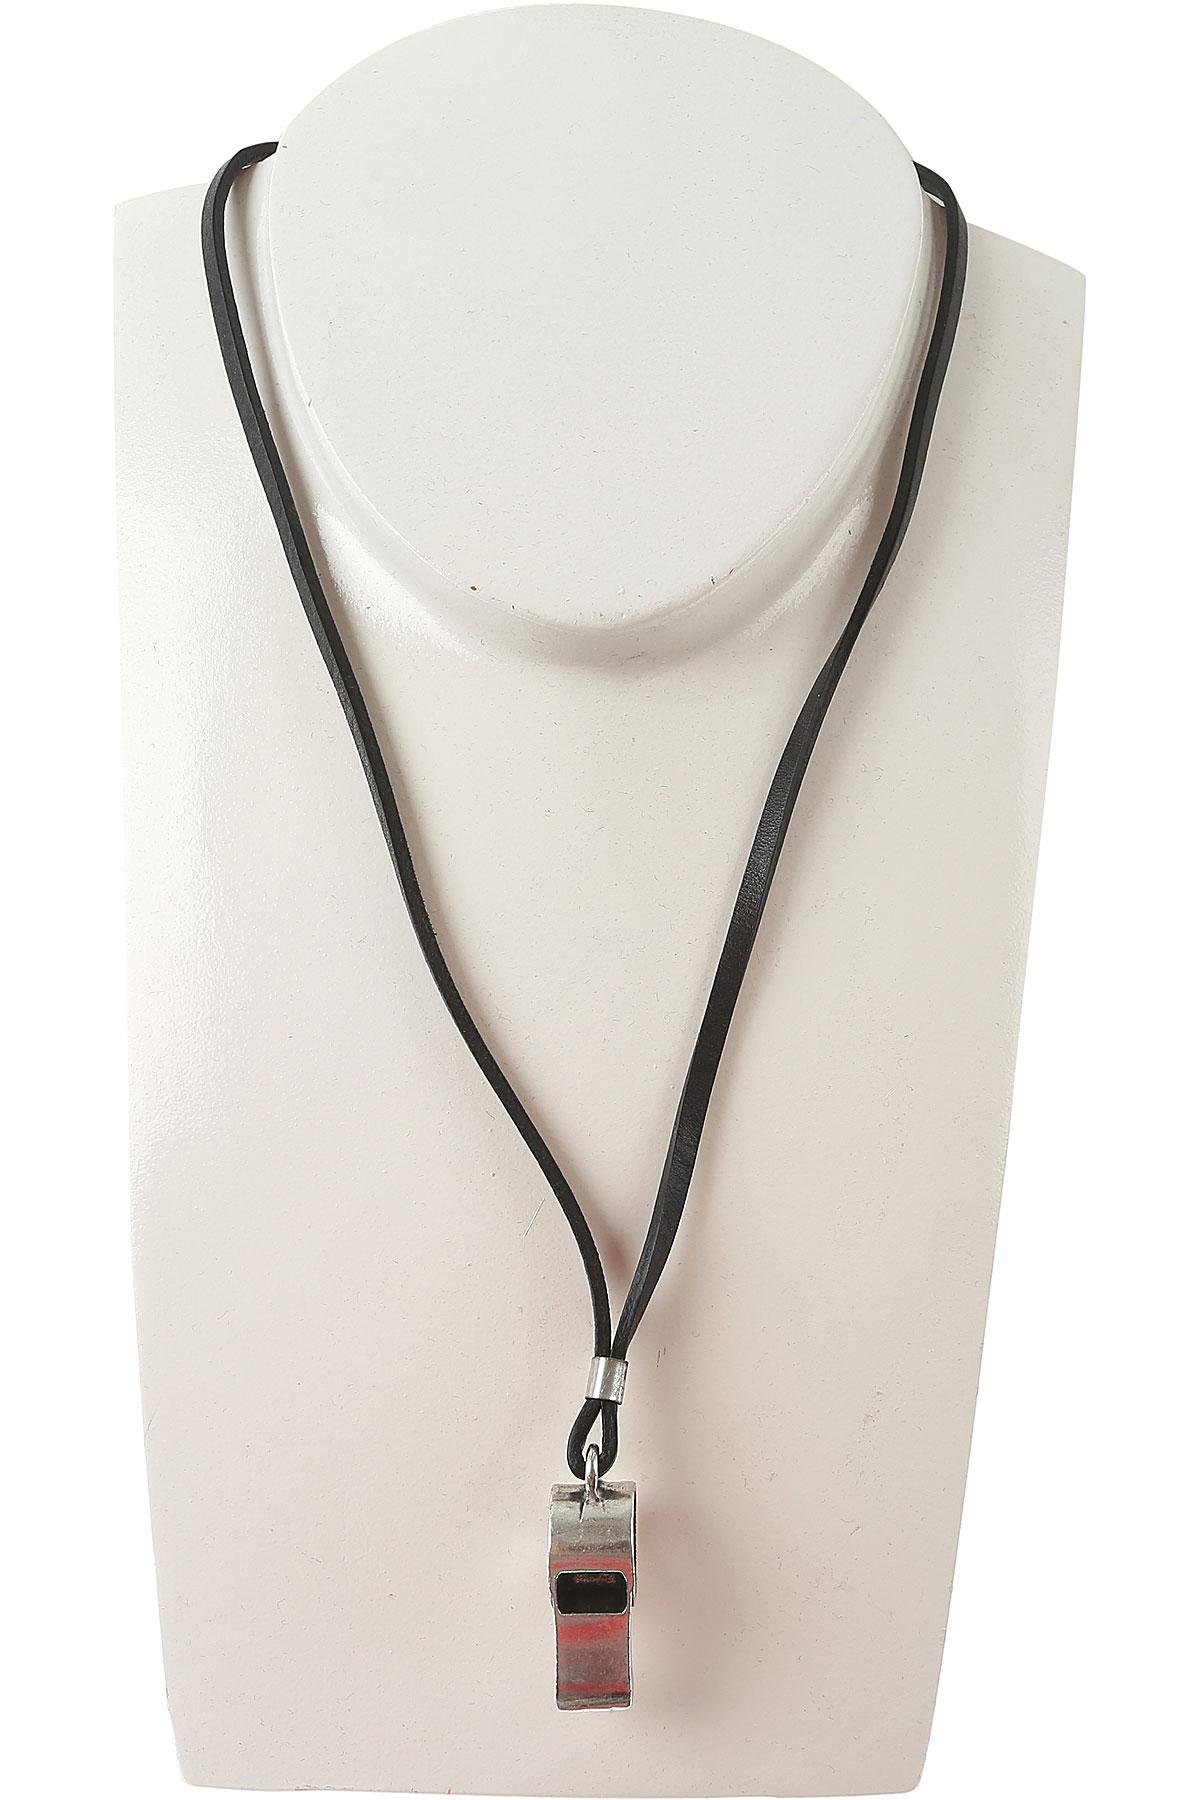 Image of Diesel Necklaces On Sale in Outlet, Stopp, Black, Zamack, 2017